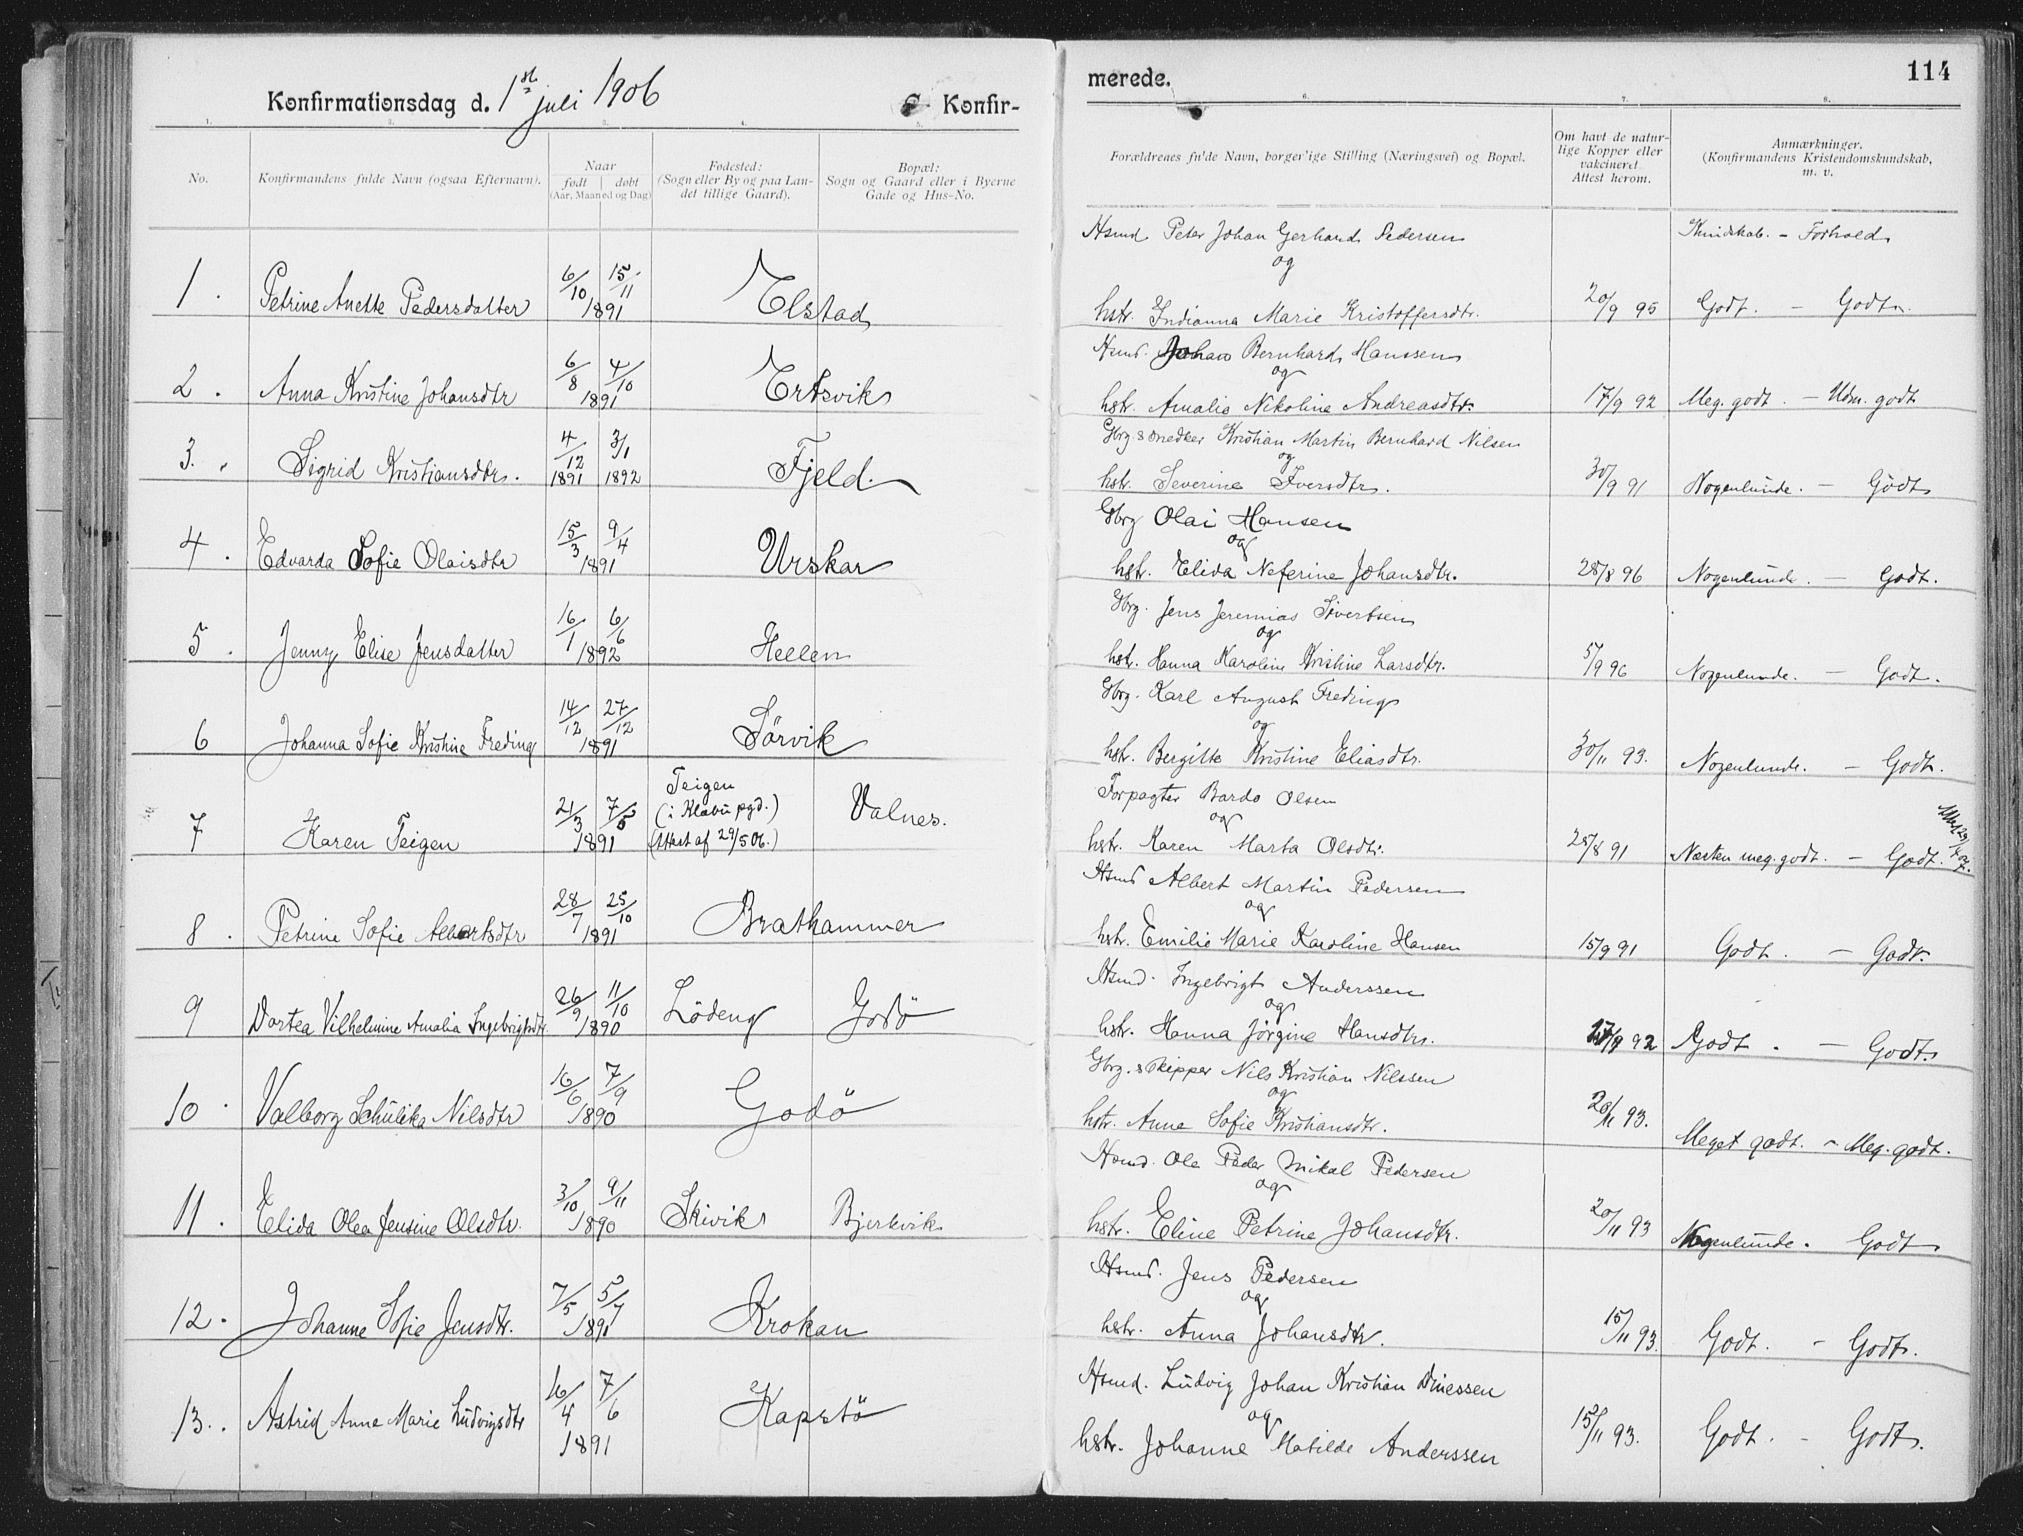 SAT, Ministerialprotokoller, klokkerbøker og fødselsregistre - Nordland, 804/L0081: Ministerialbok nr. 804A02, 1901-1915, s. 114